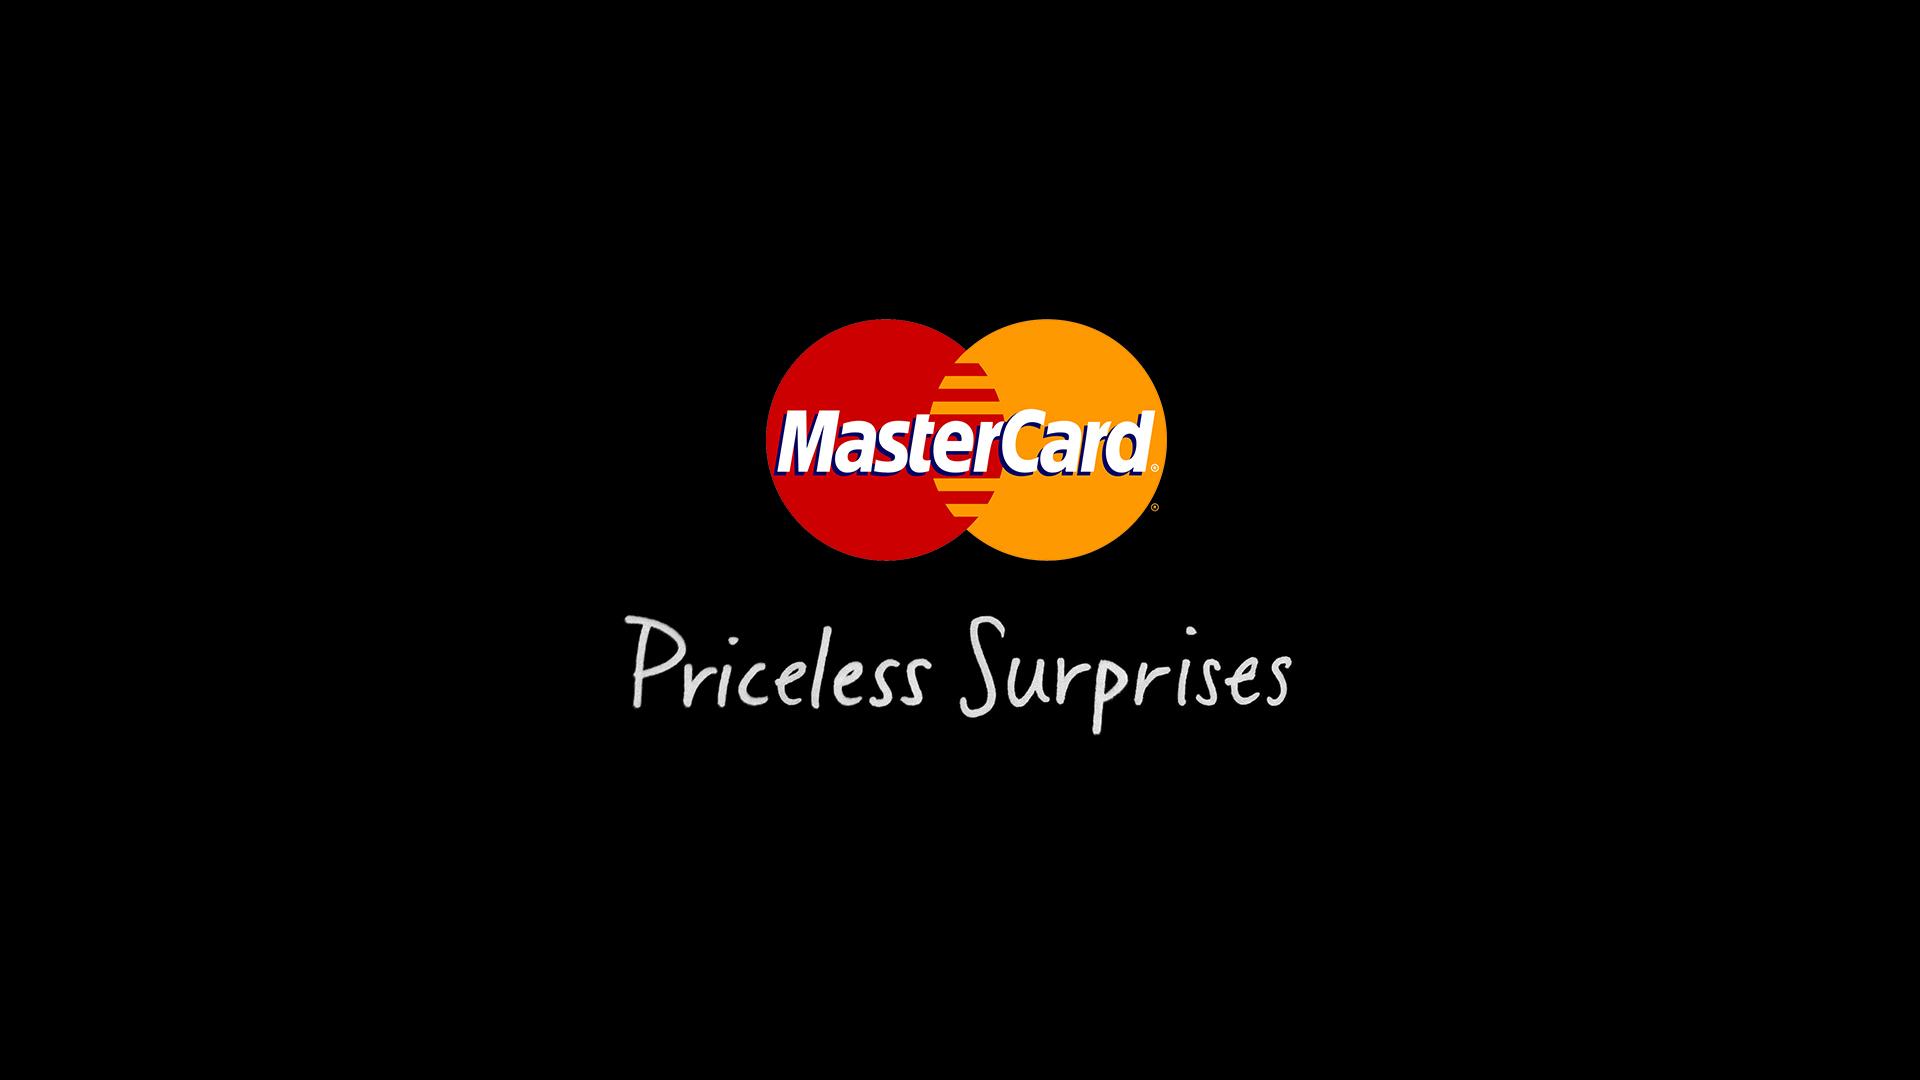 MasterCard-Priceless-Surprises